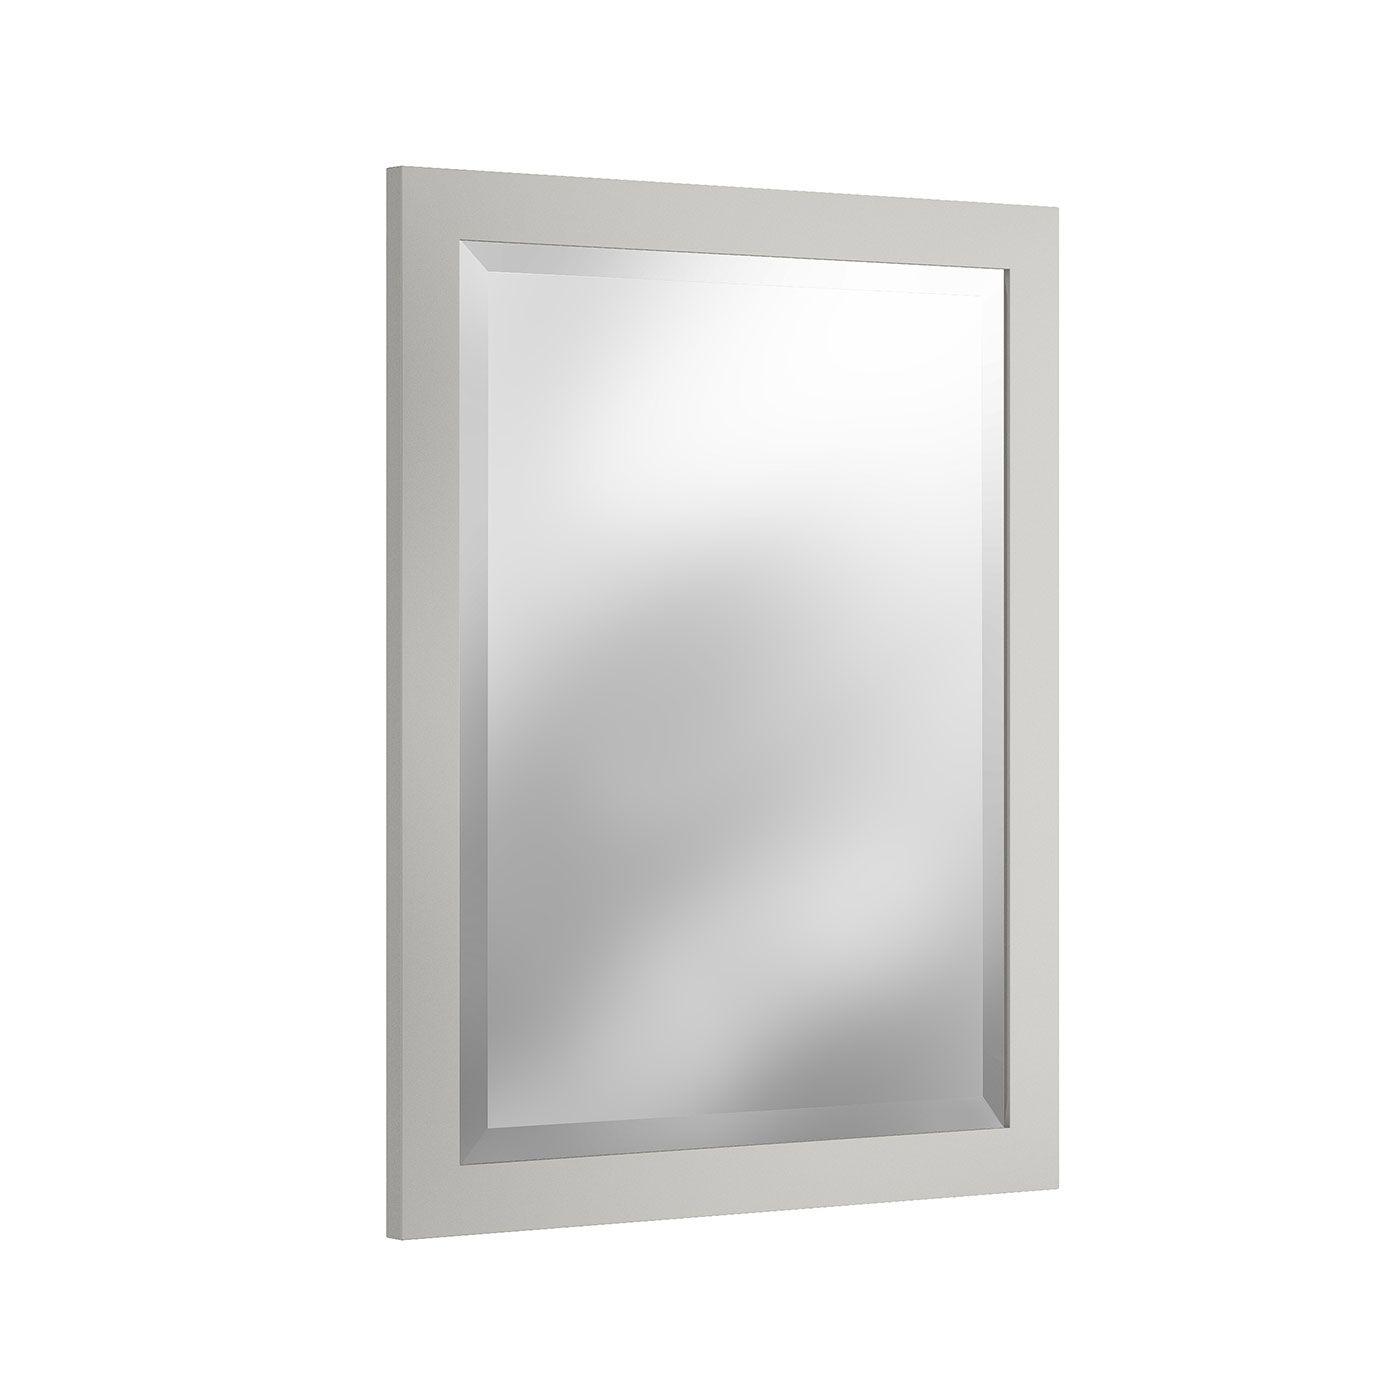 Beveled Bathroom Vanity Mirrors Beveled Bathroom Mirrors Frameless ...